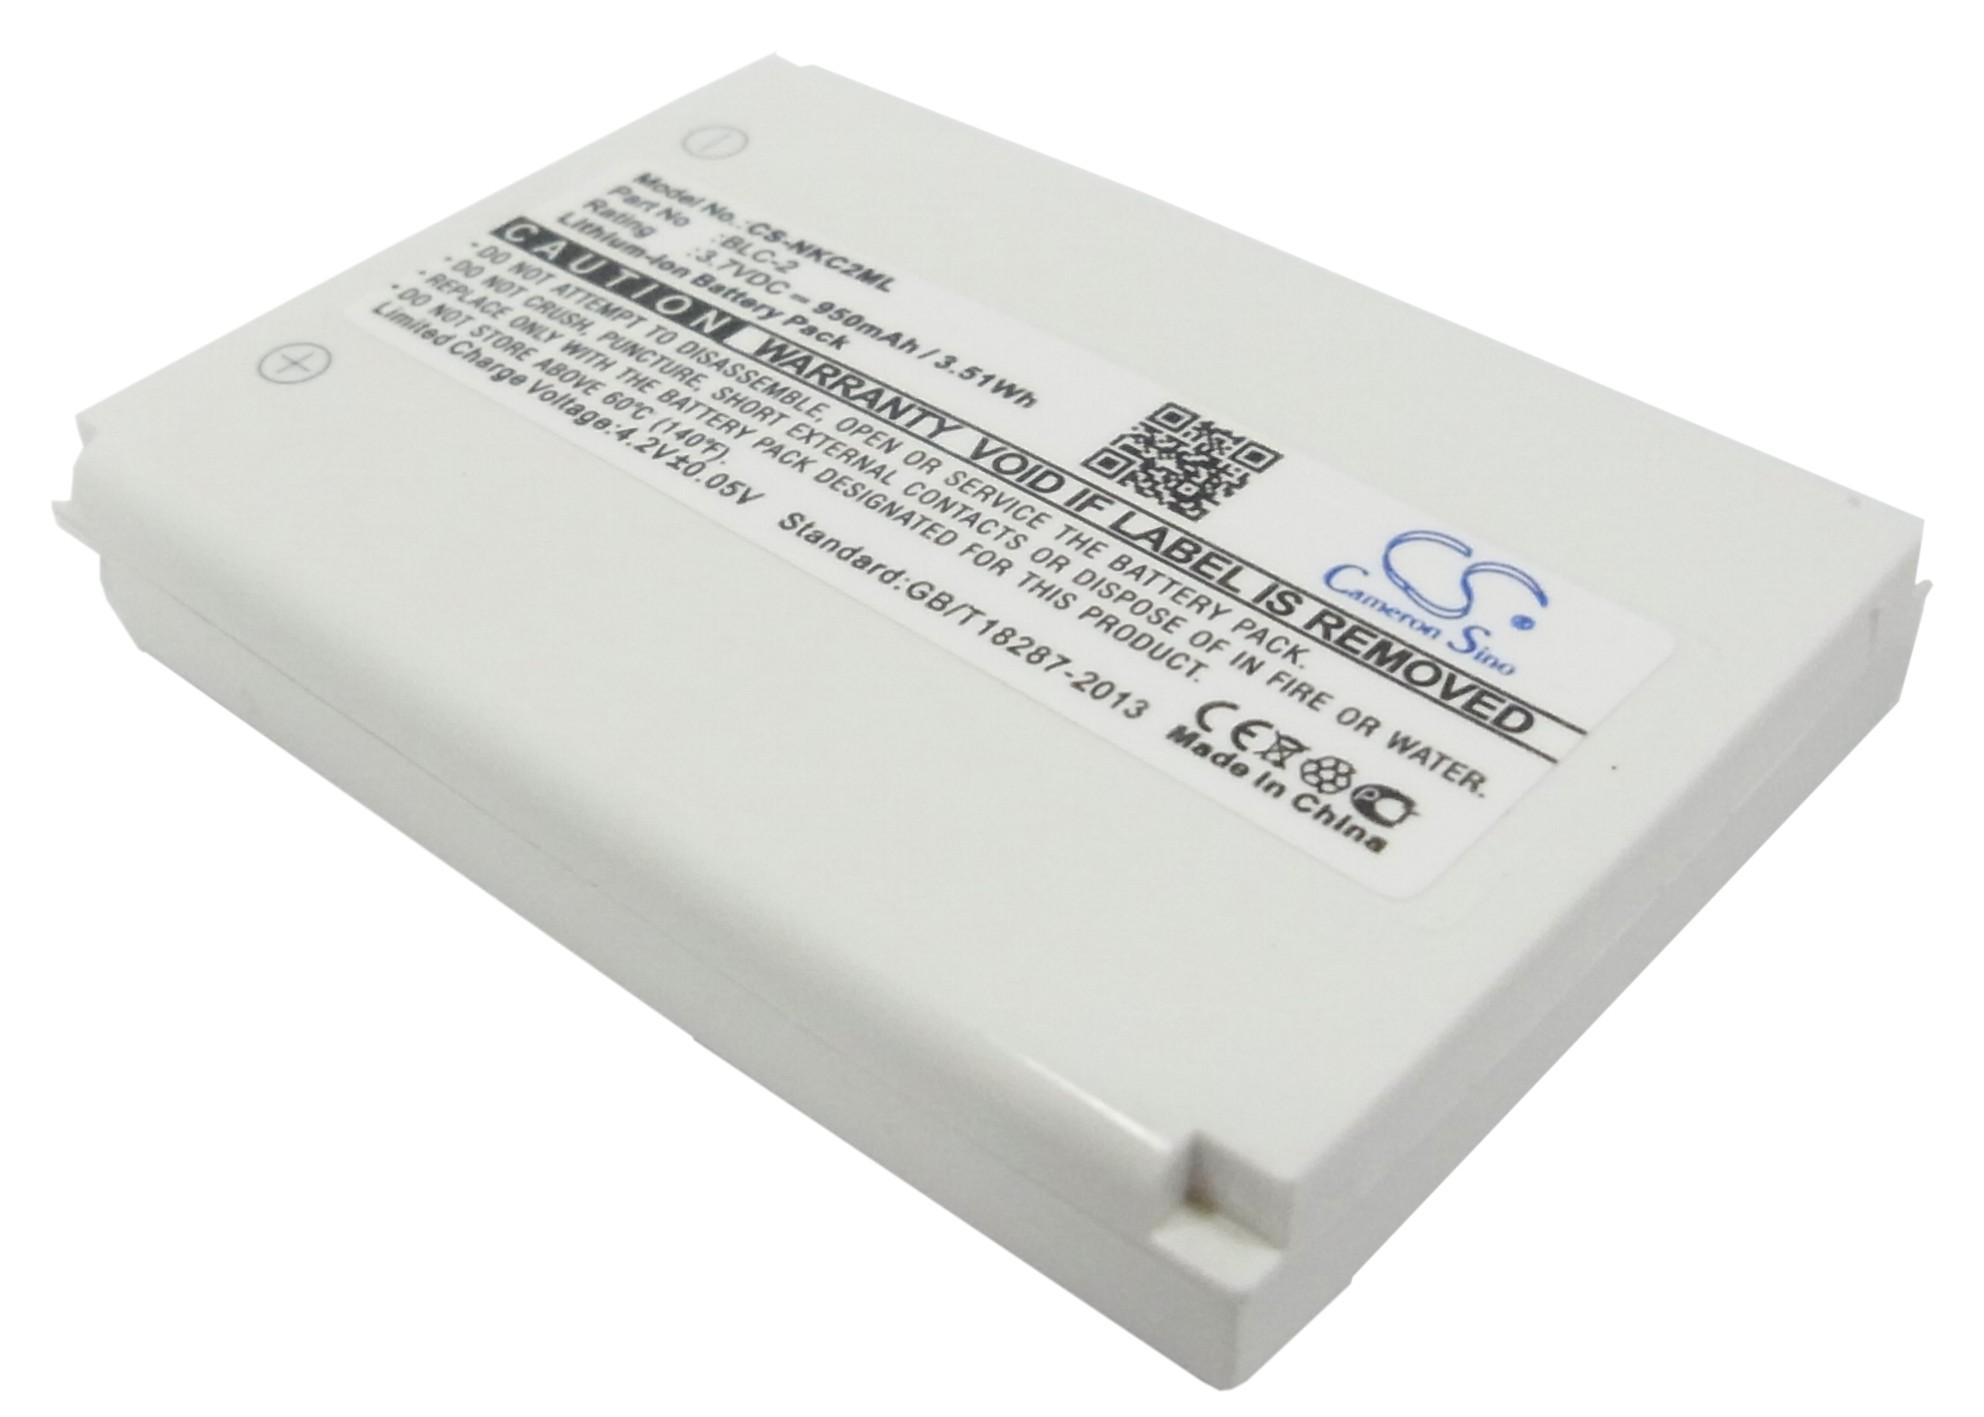 Cameron Sino baterie do mobilů pro NOKIA 3510i 3.7V Li-ion 950mAh černá - neoriginální